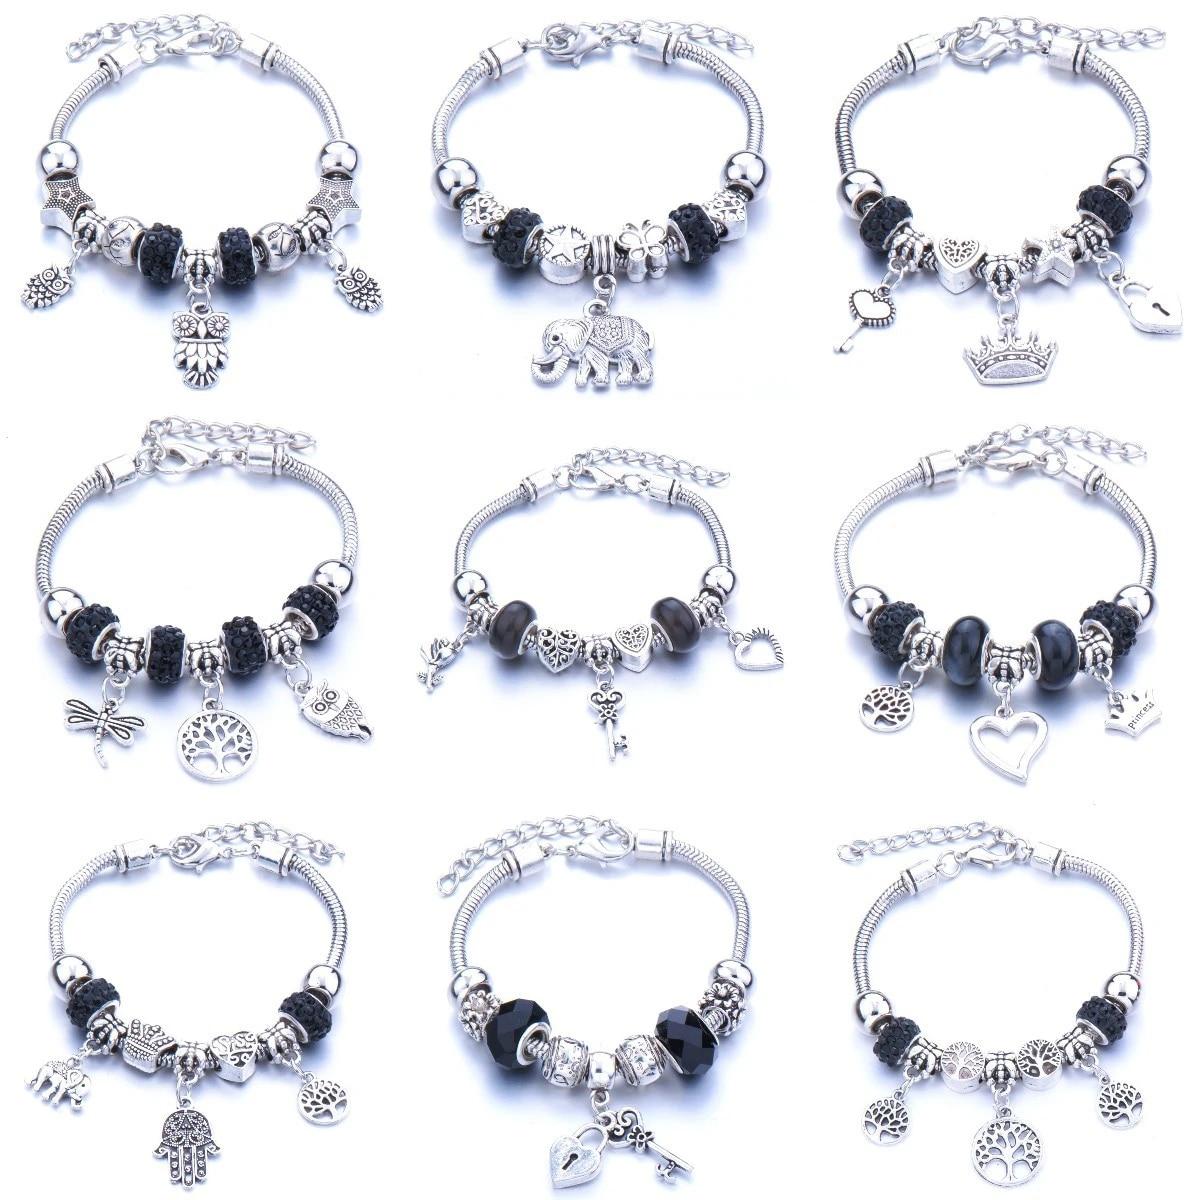 Vintage Black Tree Of Life Crown Charm Bracelets For Women Crystal Beads Pandora Bracelets Pulseras Mujer Charms Jewelry Charm Bracelets Aliexpress